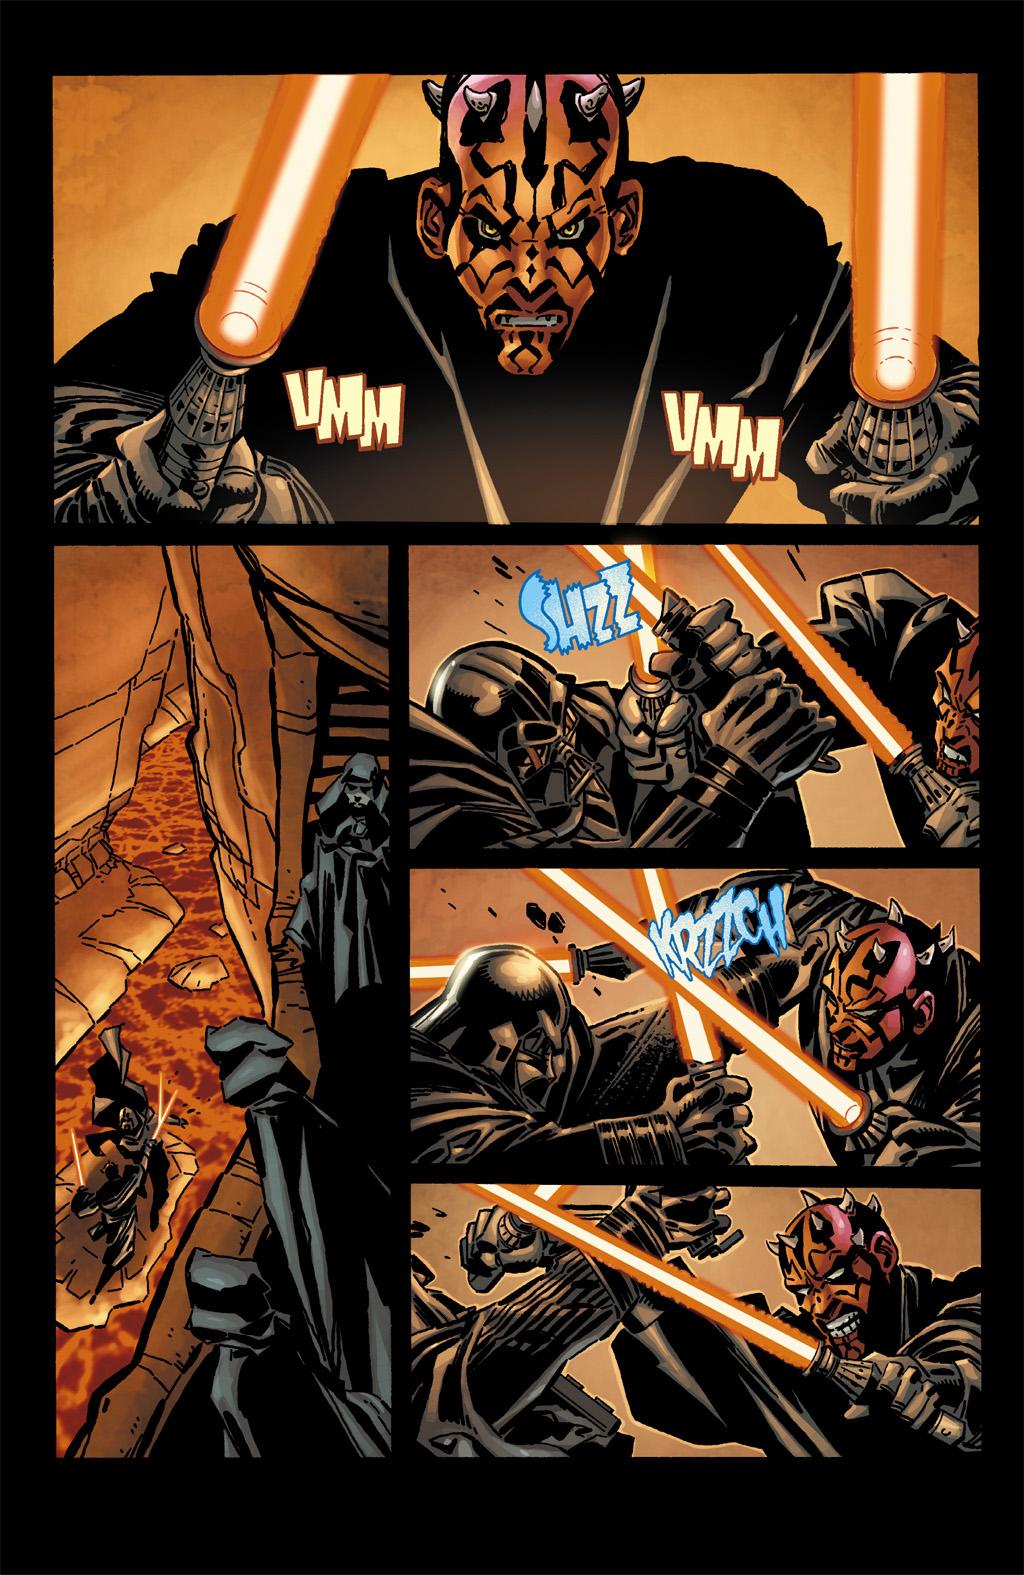 Darth Vader (RotJ) and Luke Skywalker (RotJ) vs B-Team - Page 5 BFDglDdELUNsR8b5-DgY5AC-sZ-Oo7lofJJGaQz7oFLrppAGfMRICY20TTQKsOxUAmWcFAVVHyOO=s1600